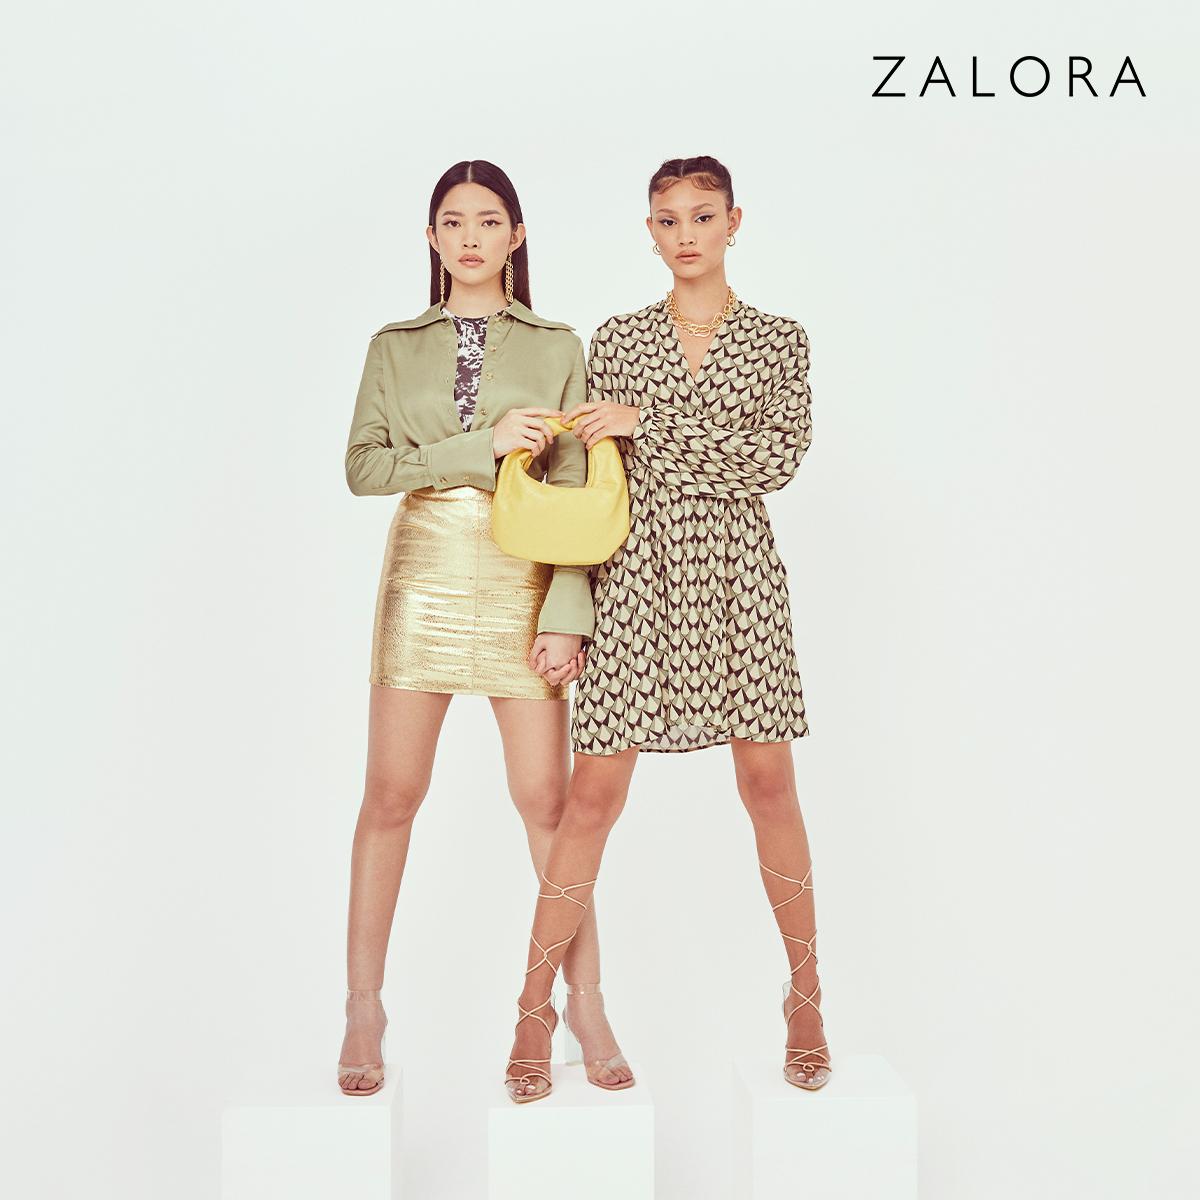 Zalora - Up To 20% Off Purchases + 3% Cashback